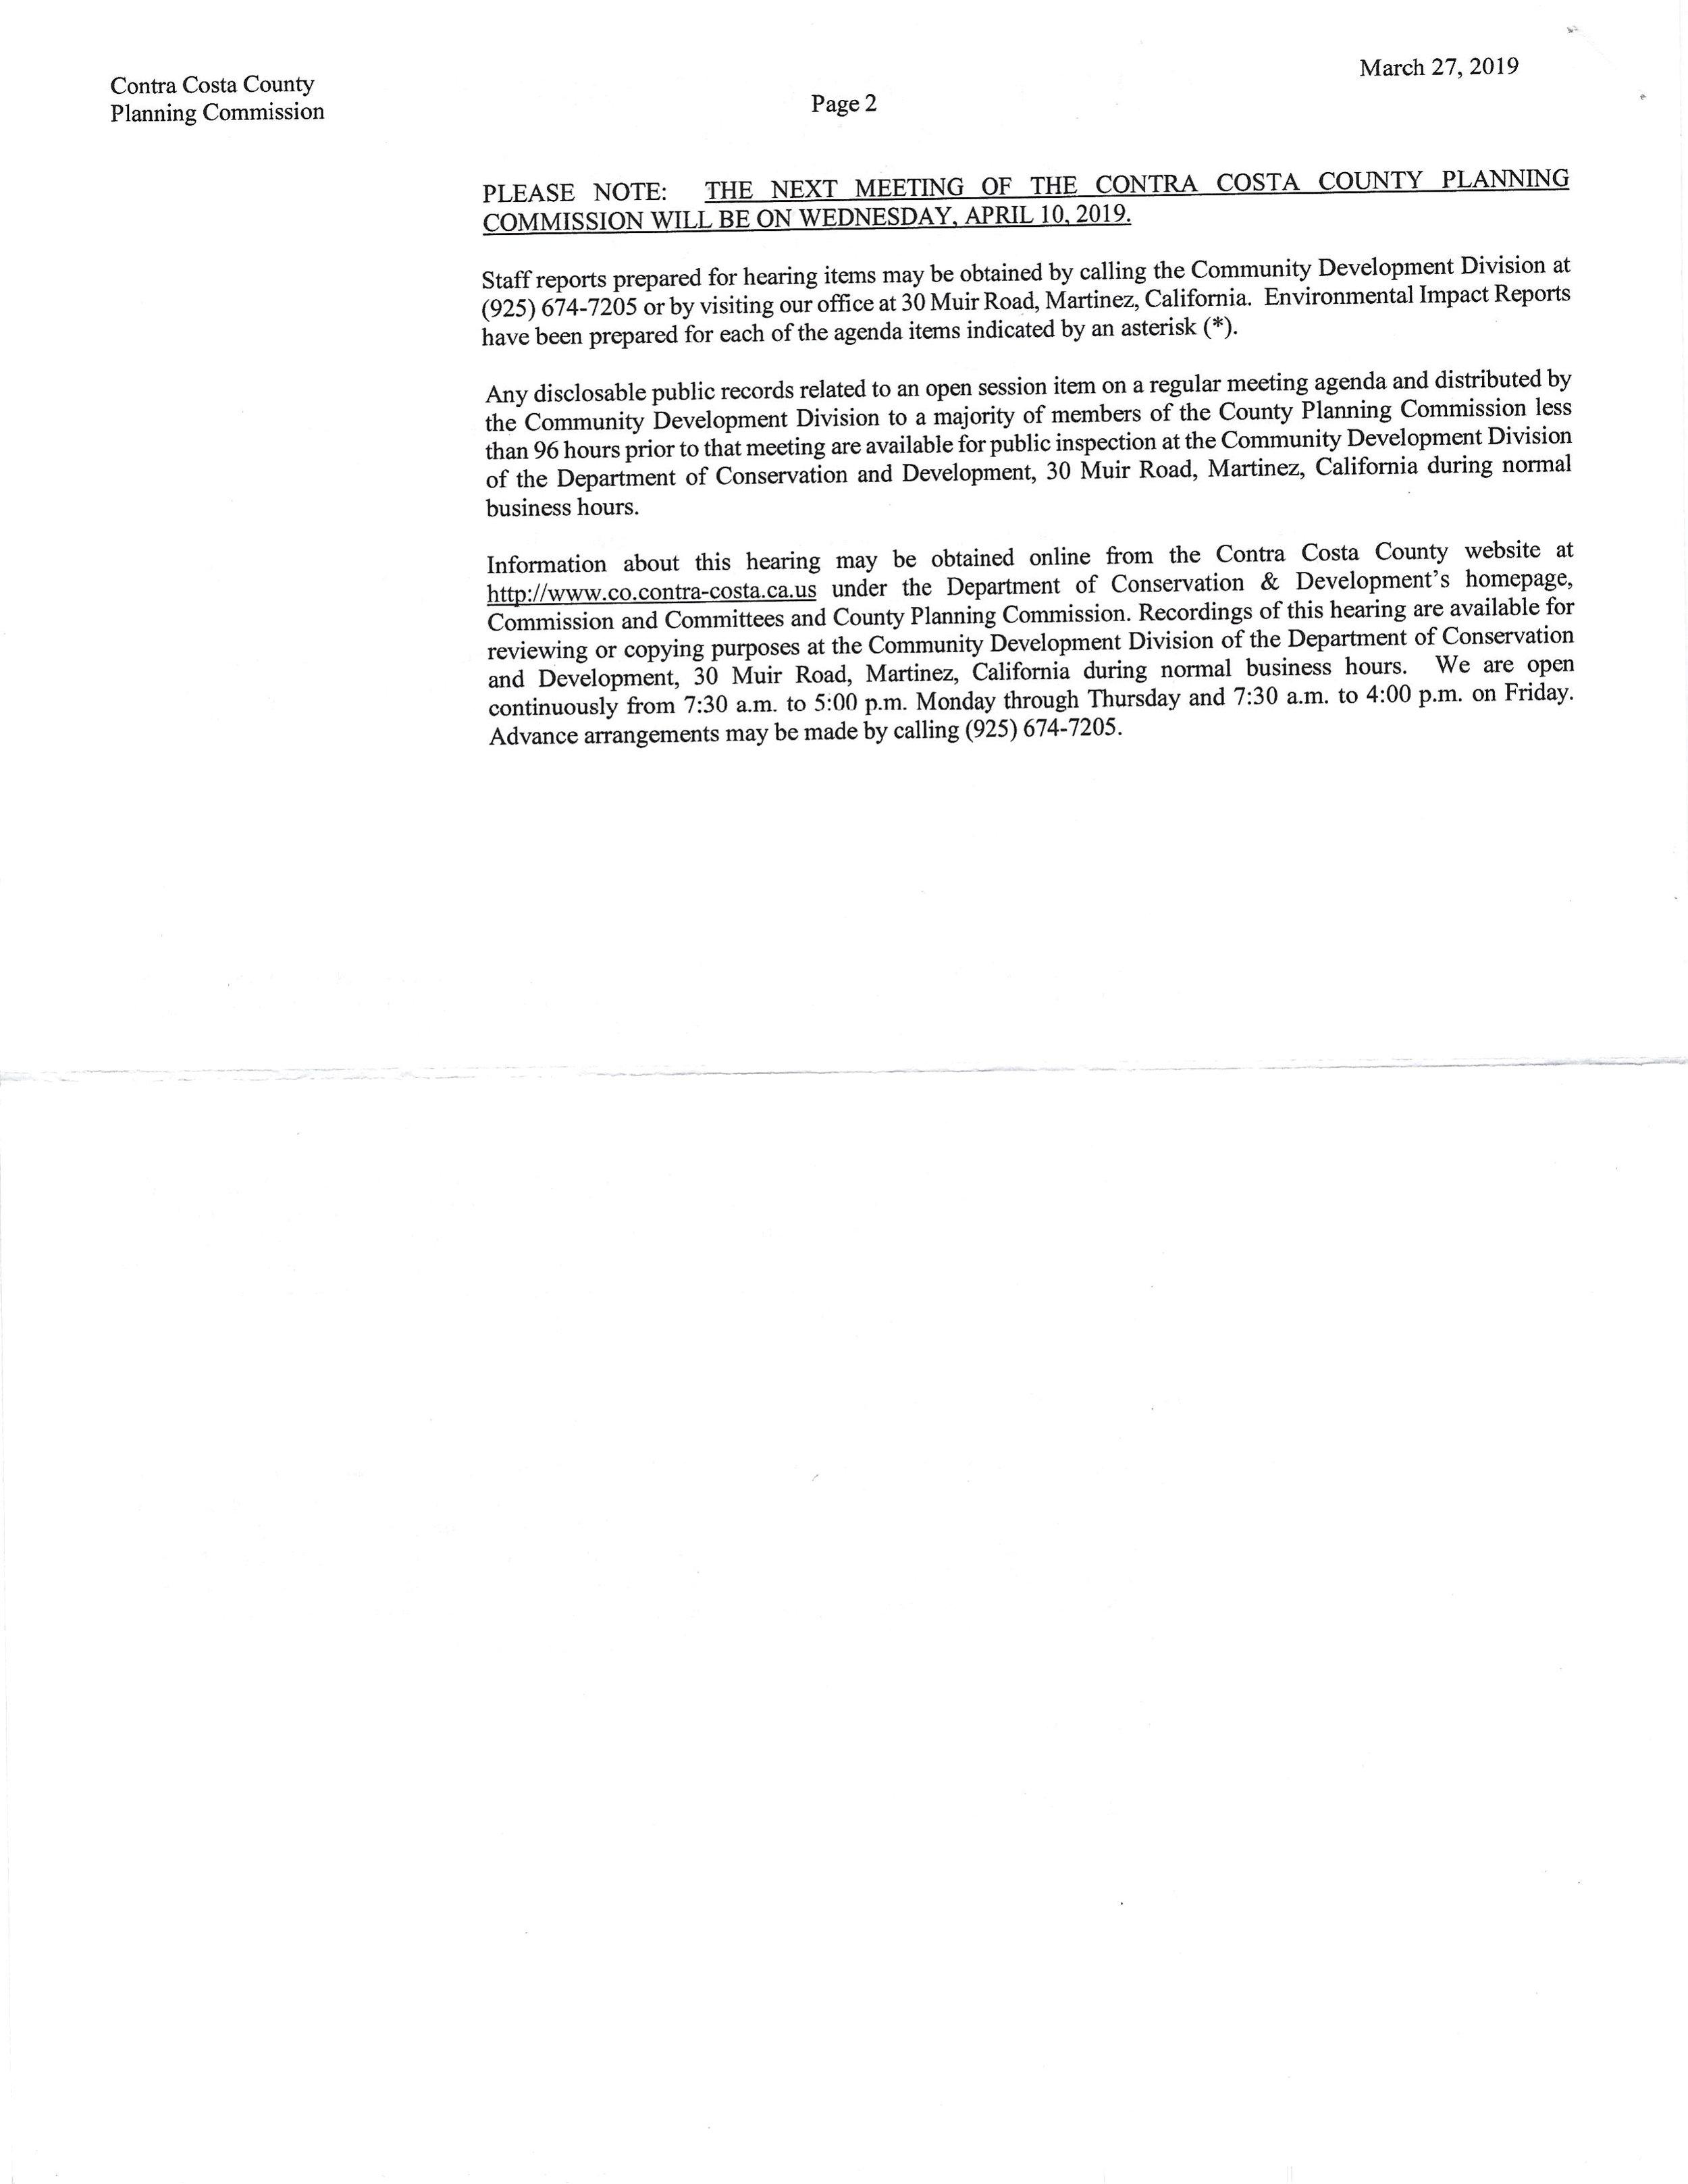 ESMAC Agenda 4.10.19_9.jpg